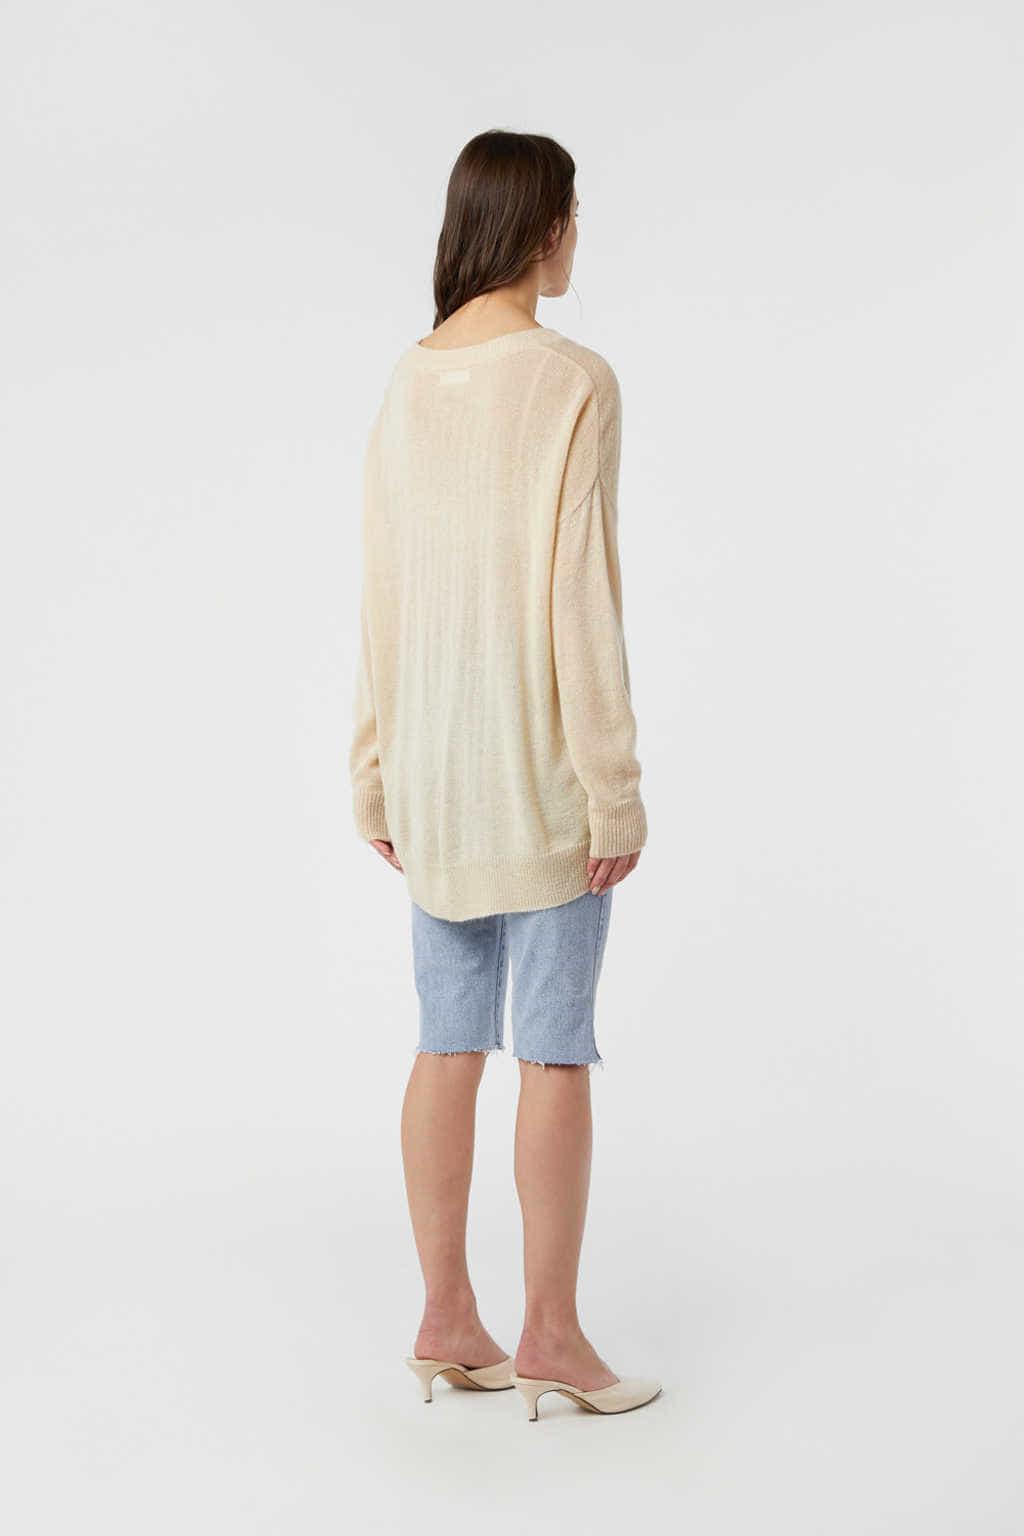 Sweater 2980 Cream 4